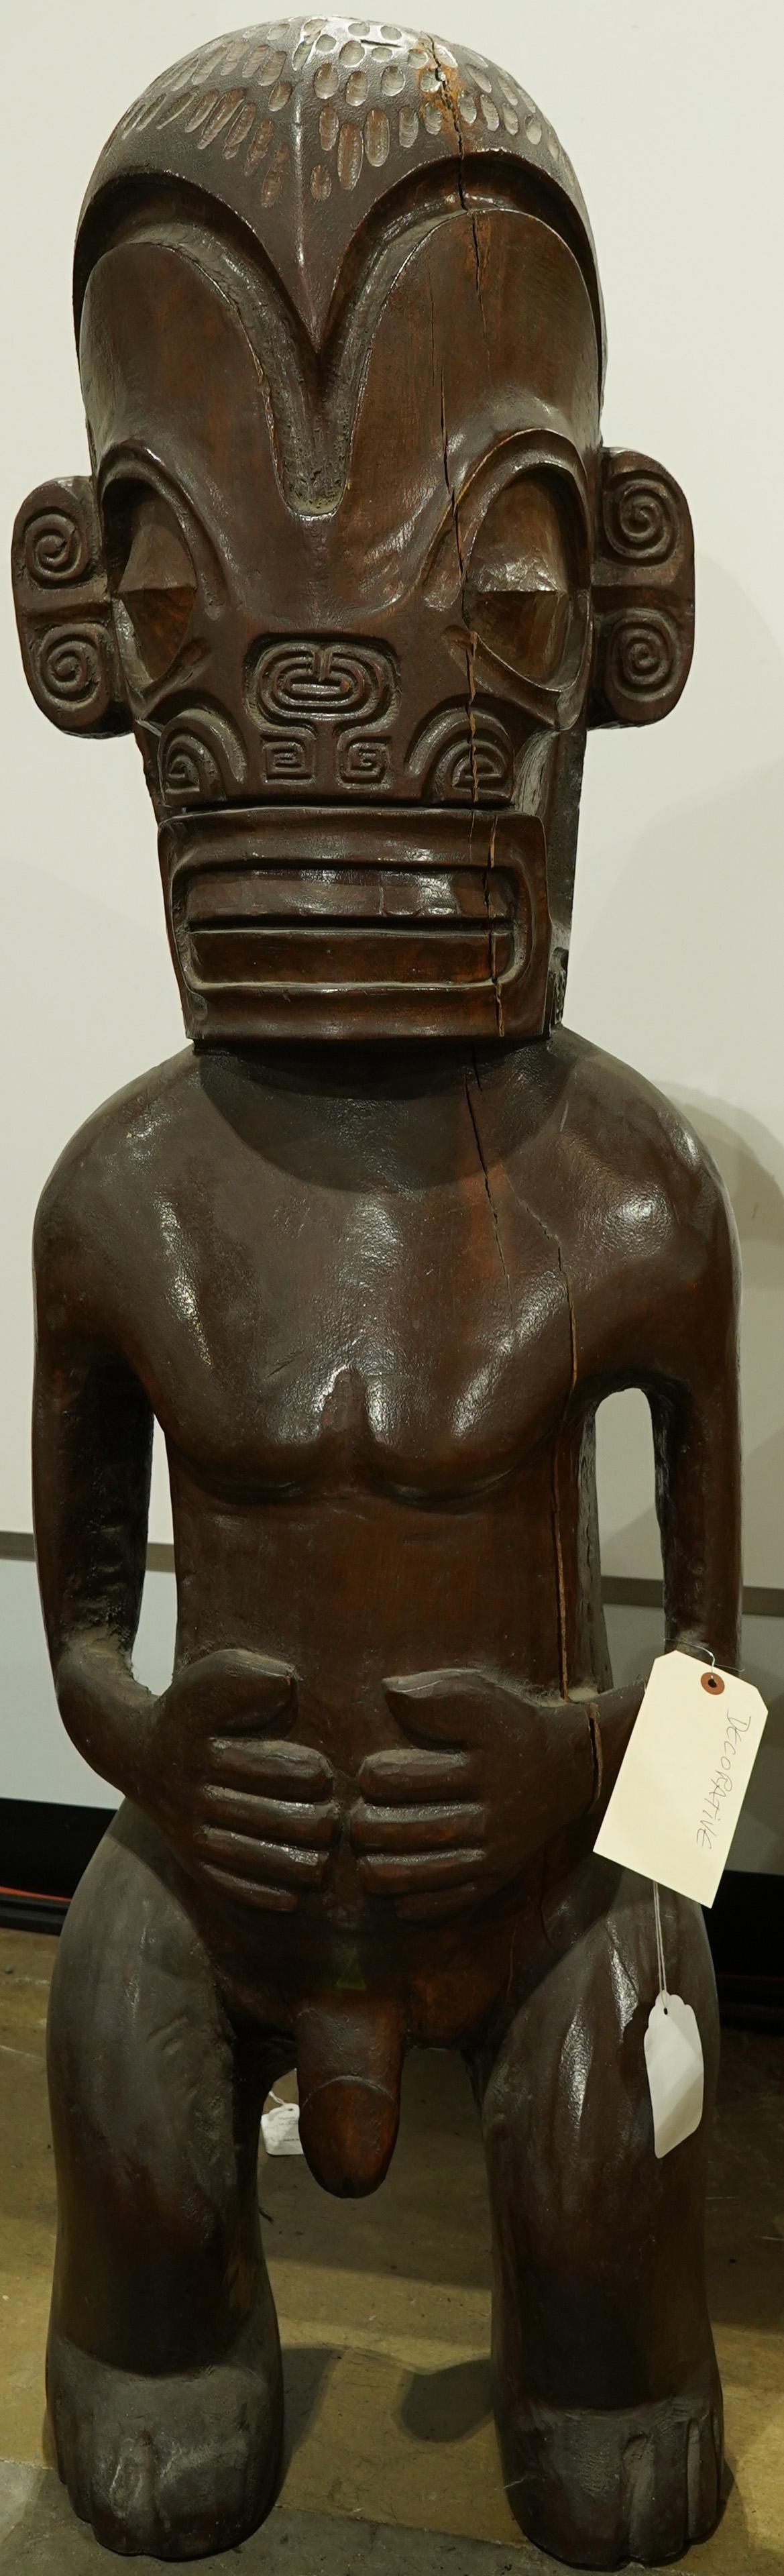 A decorative polynesian wood sculpture of a tiki